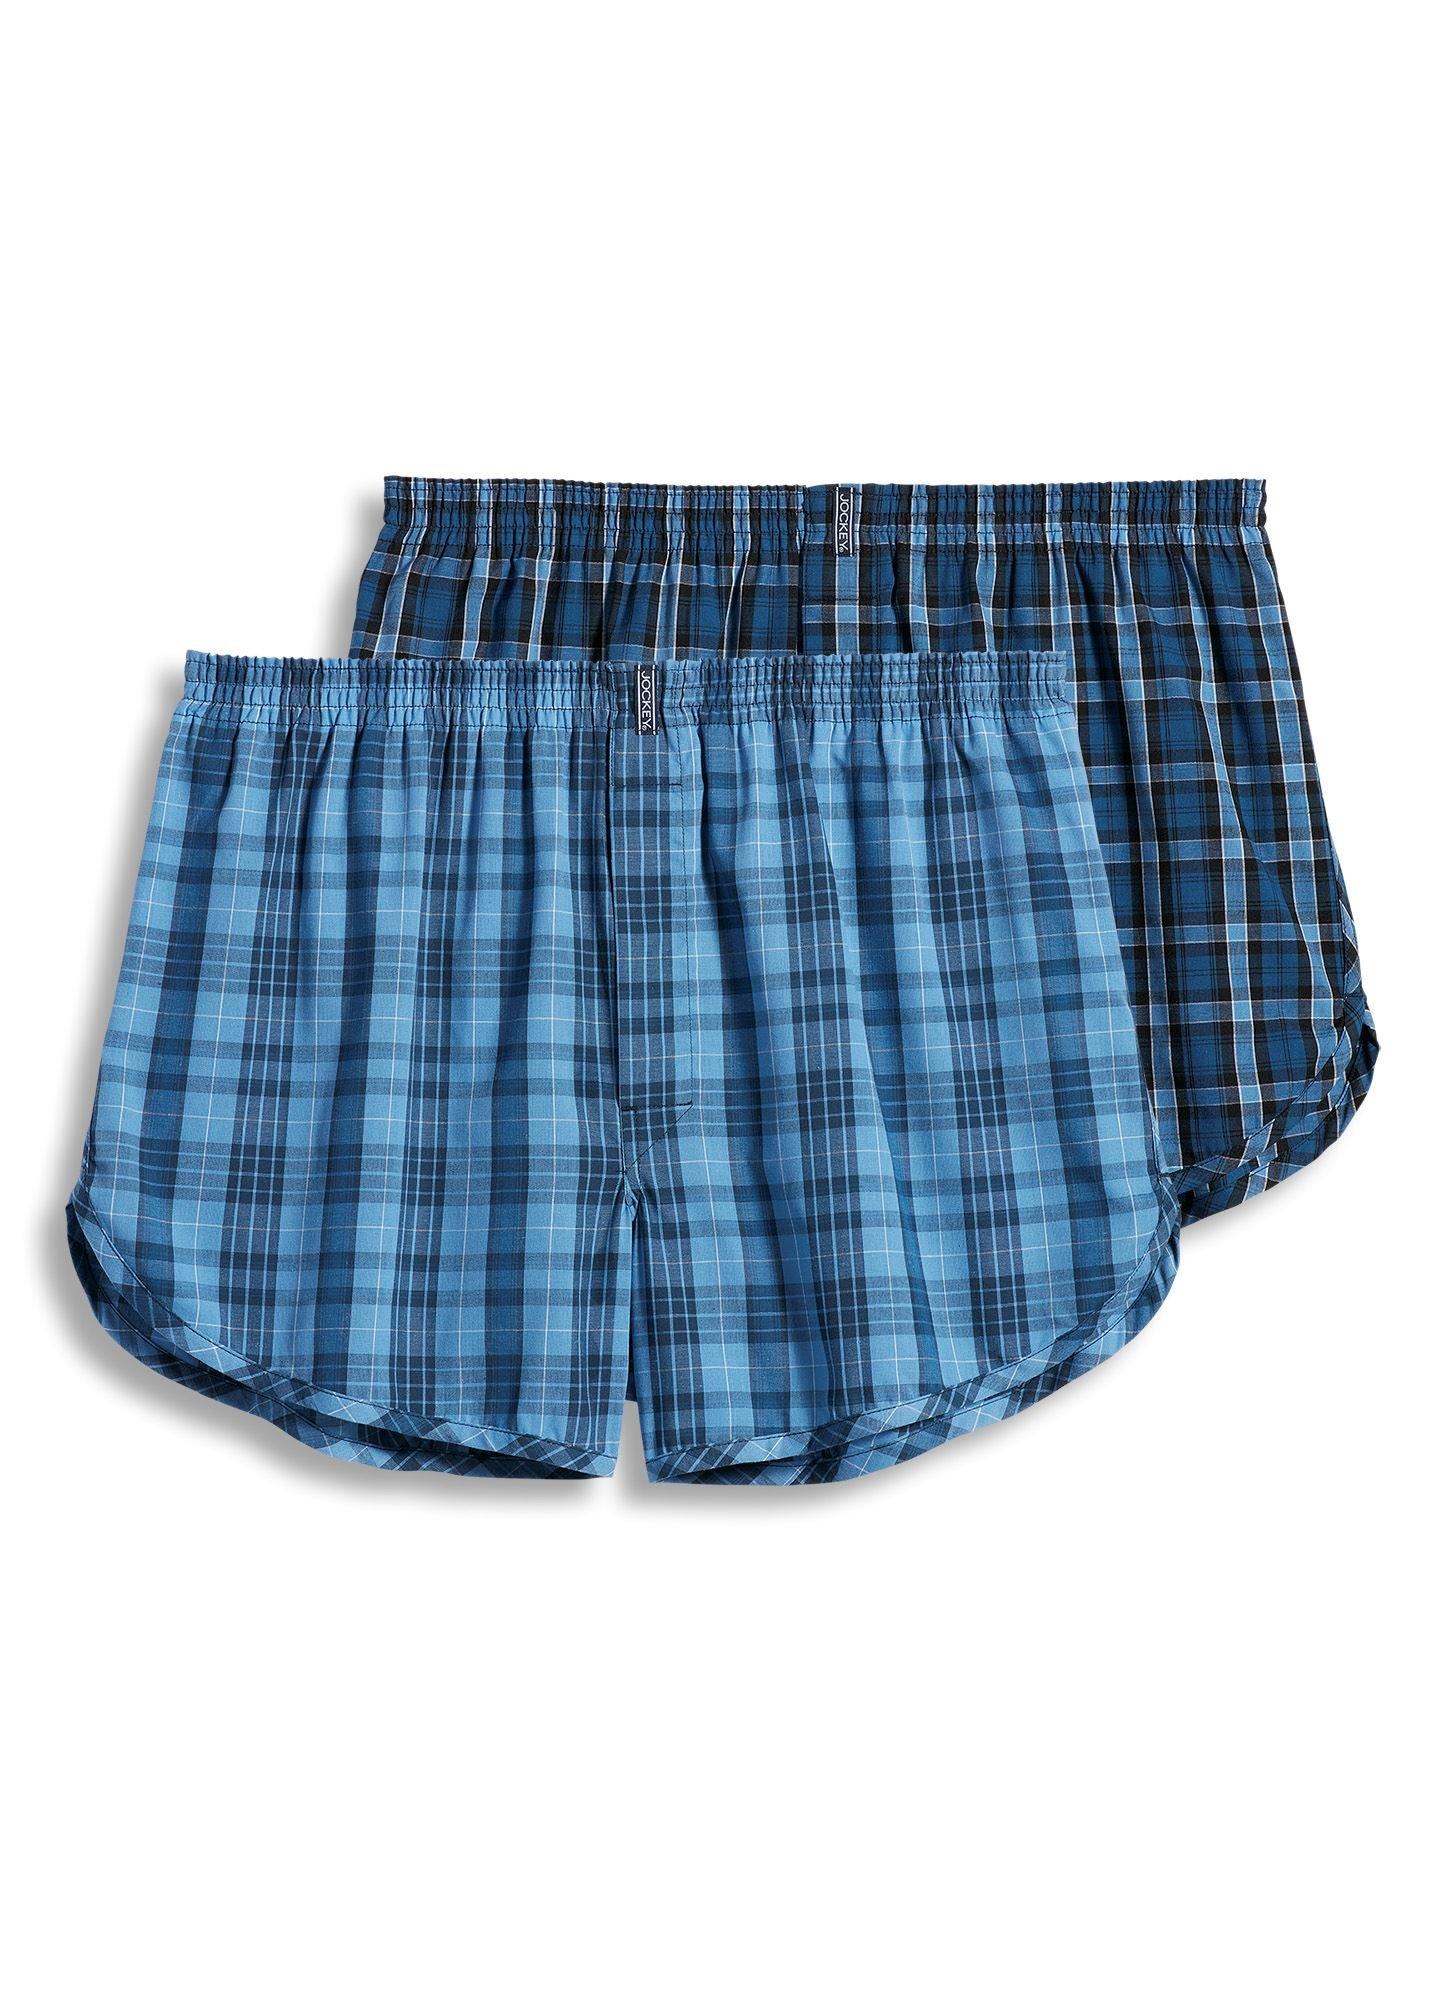 Jockey Men's Underwear Tapered Boxer - 2 Pack, blue plaids, L